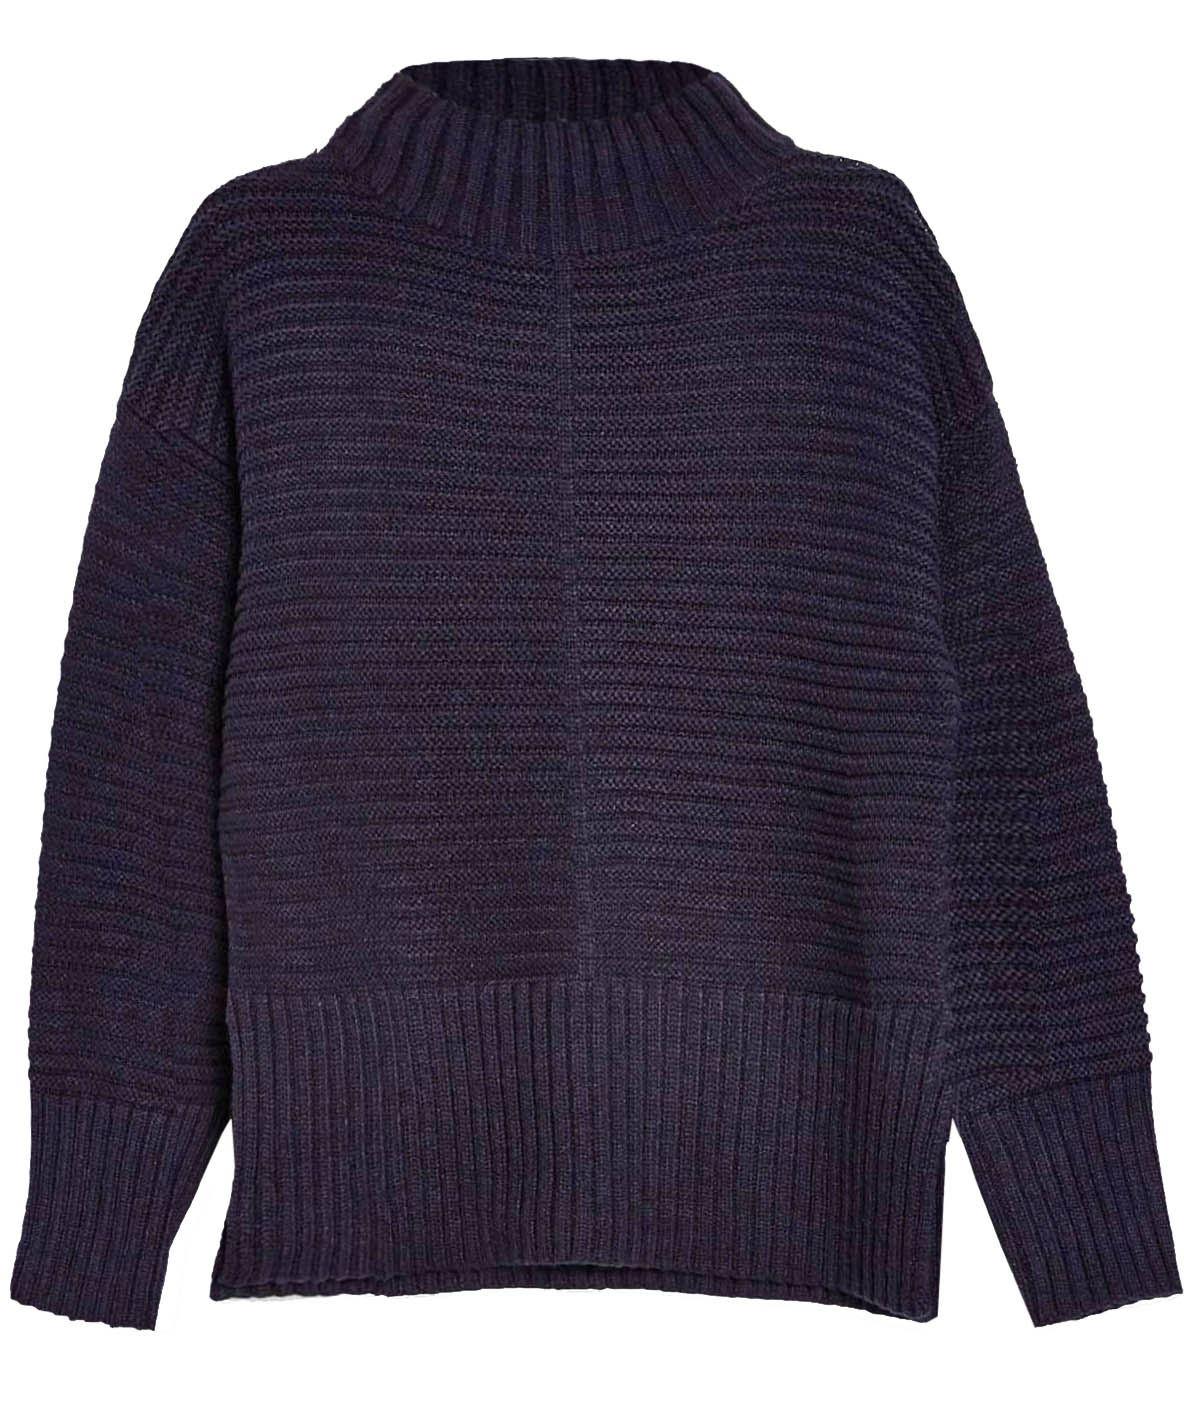 TOPSHOP Funnel Neck Rib Knit Weekend Casual Jumper Side SplitsSALERRP £36